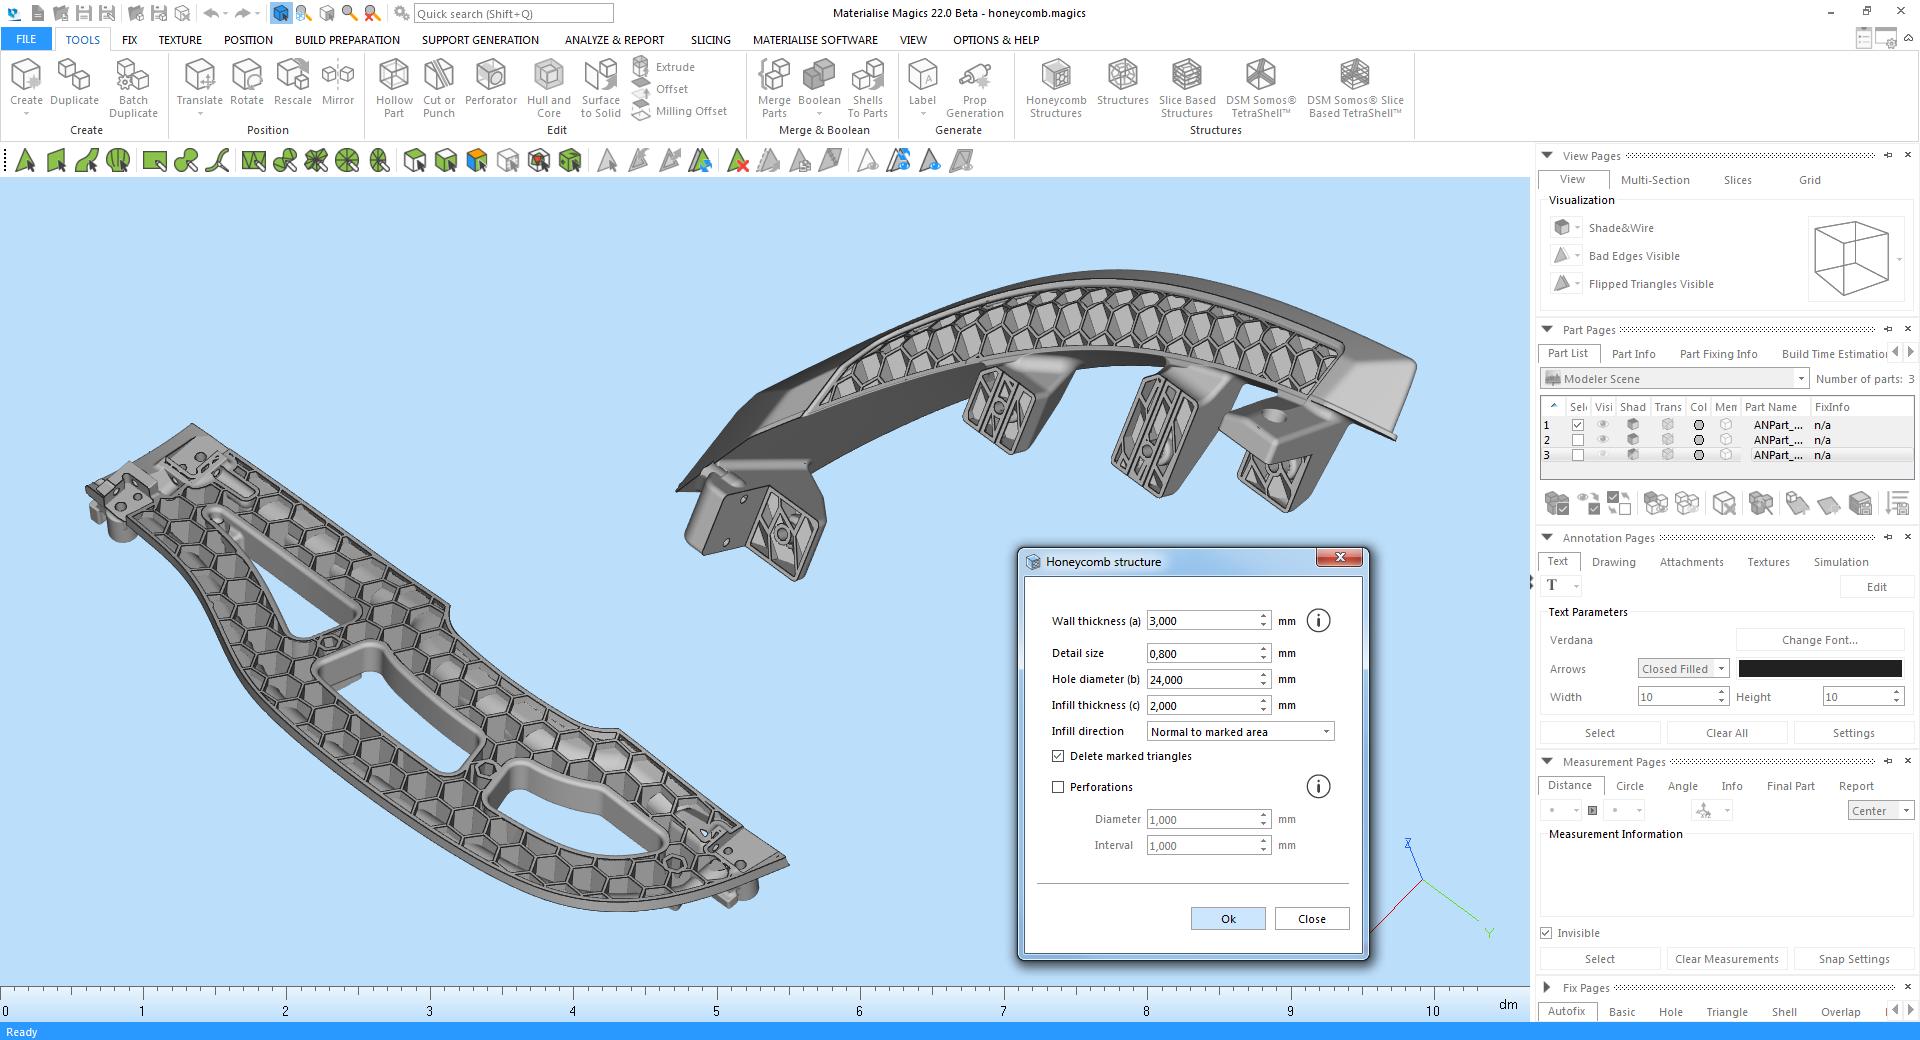 Materialise magics 22 3d druck software - Magics 22 - Materialise stellt neuste Version seiner Datenaufbereitungssoftware für den 3D-Druck vor